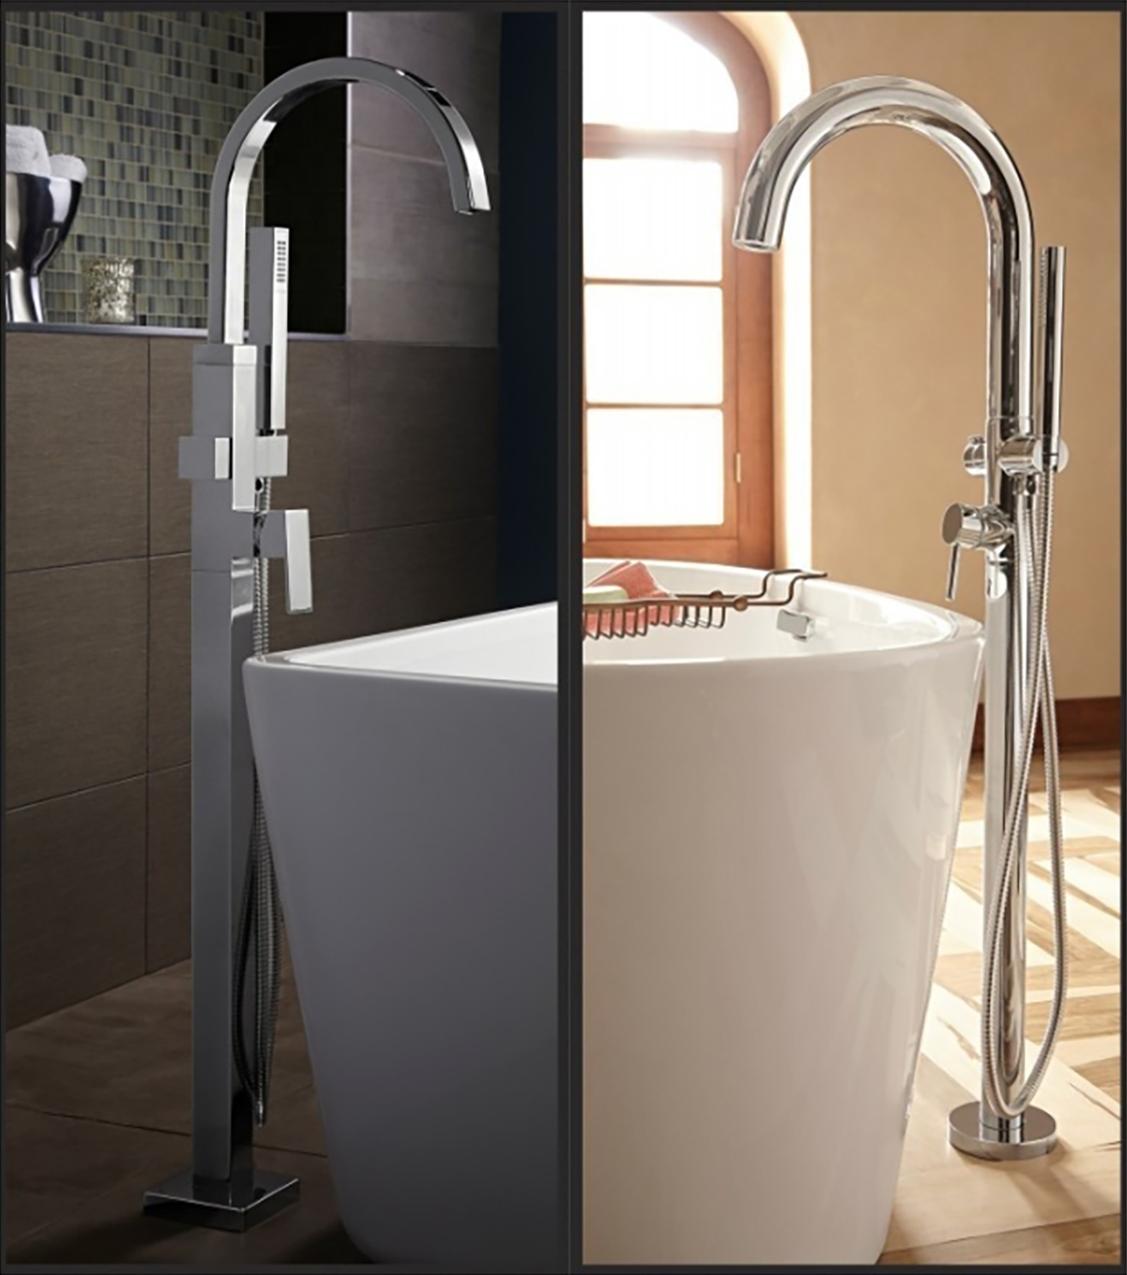 Floor Mounted Tub Fillers Provide Water Saving Drip Free